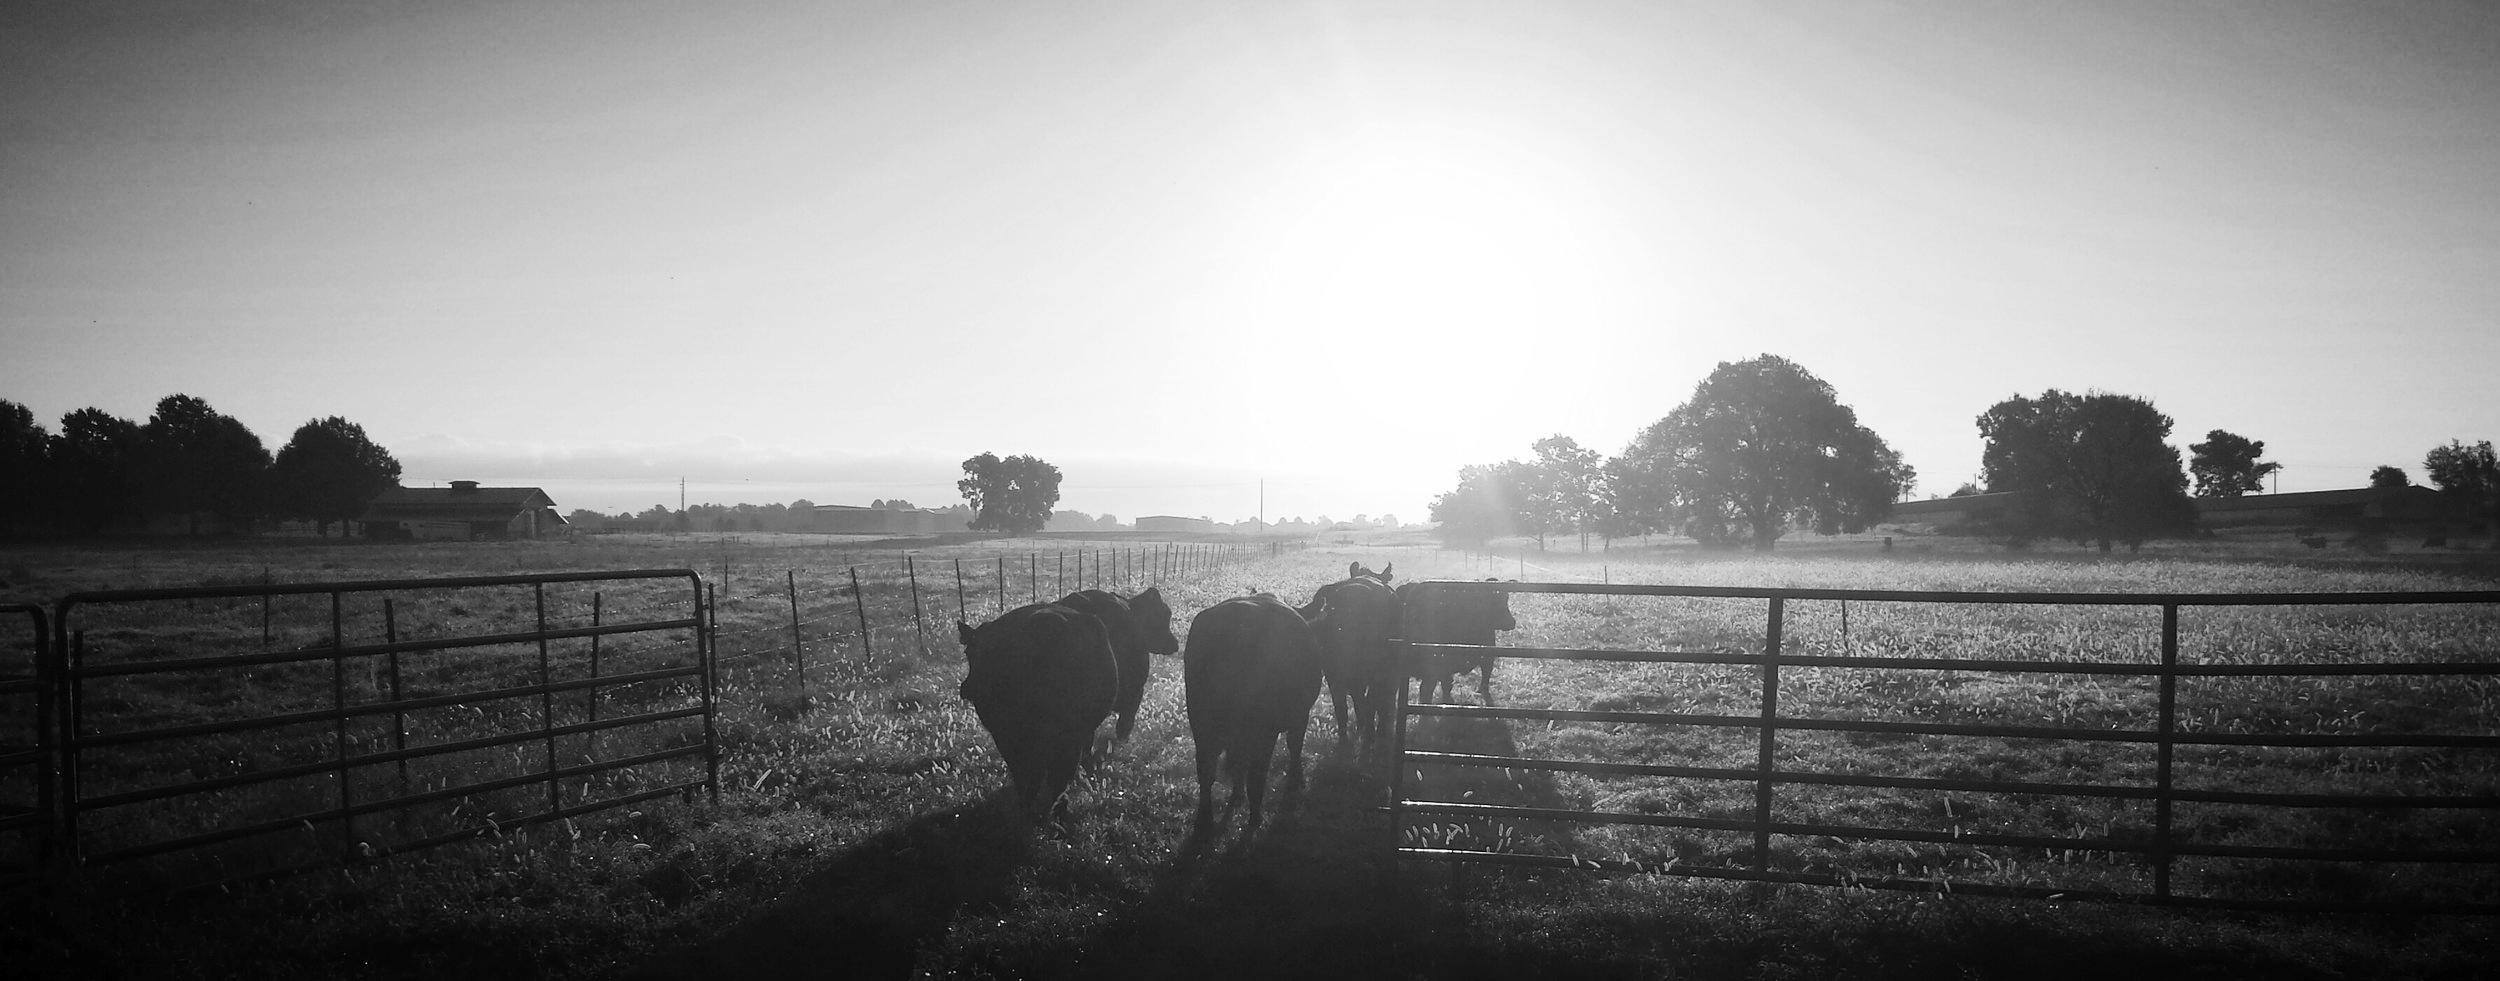 new cows.jpg